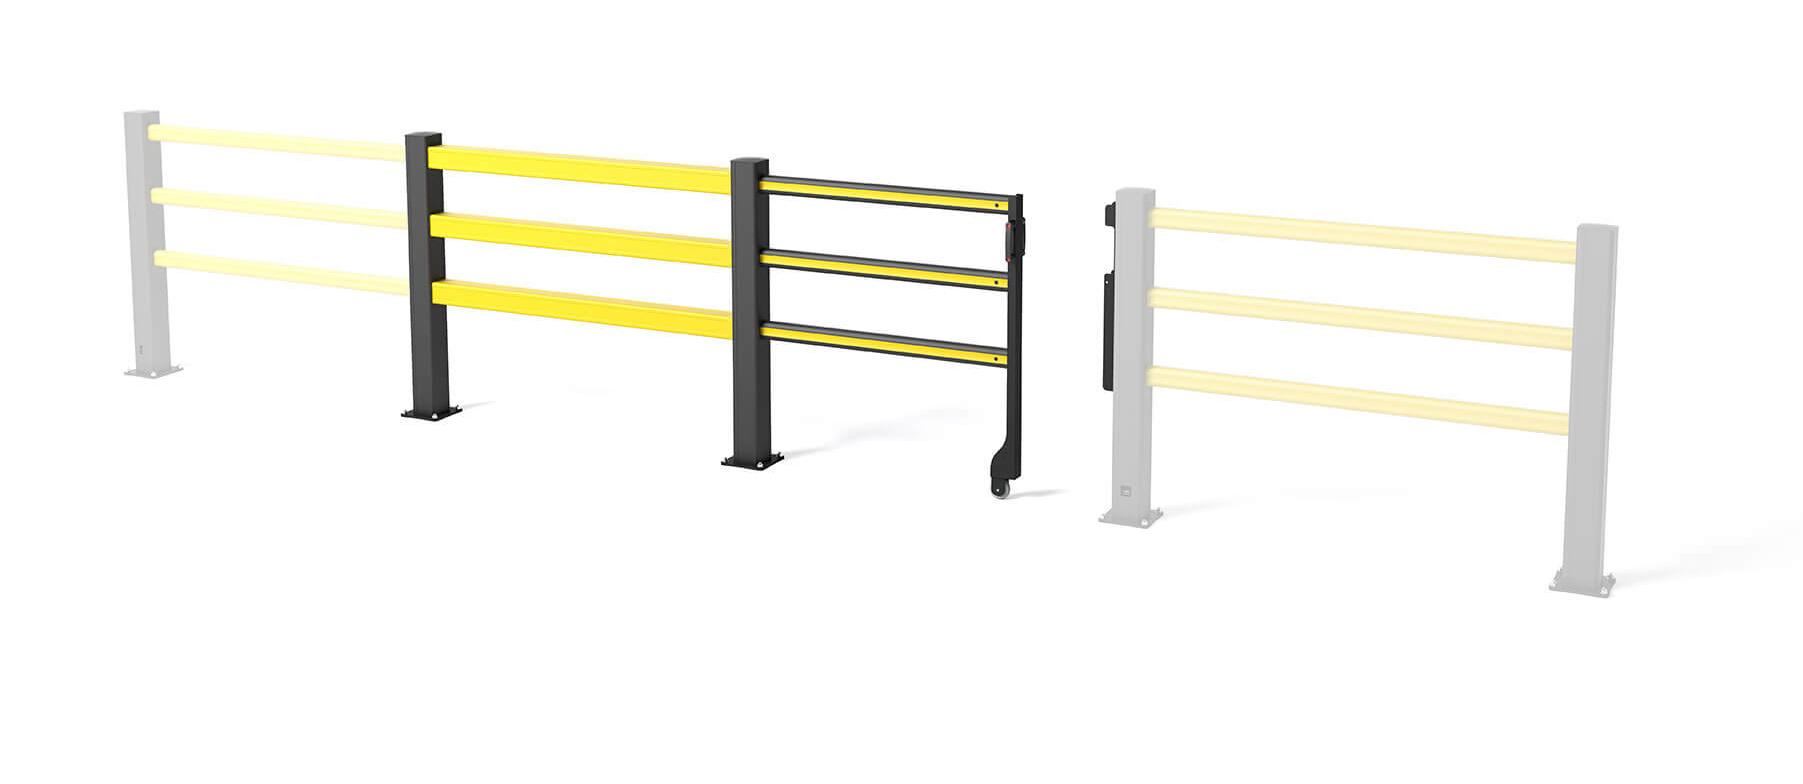 Flex Impact Safety Gate SG Sliding